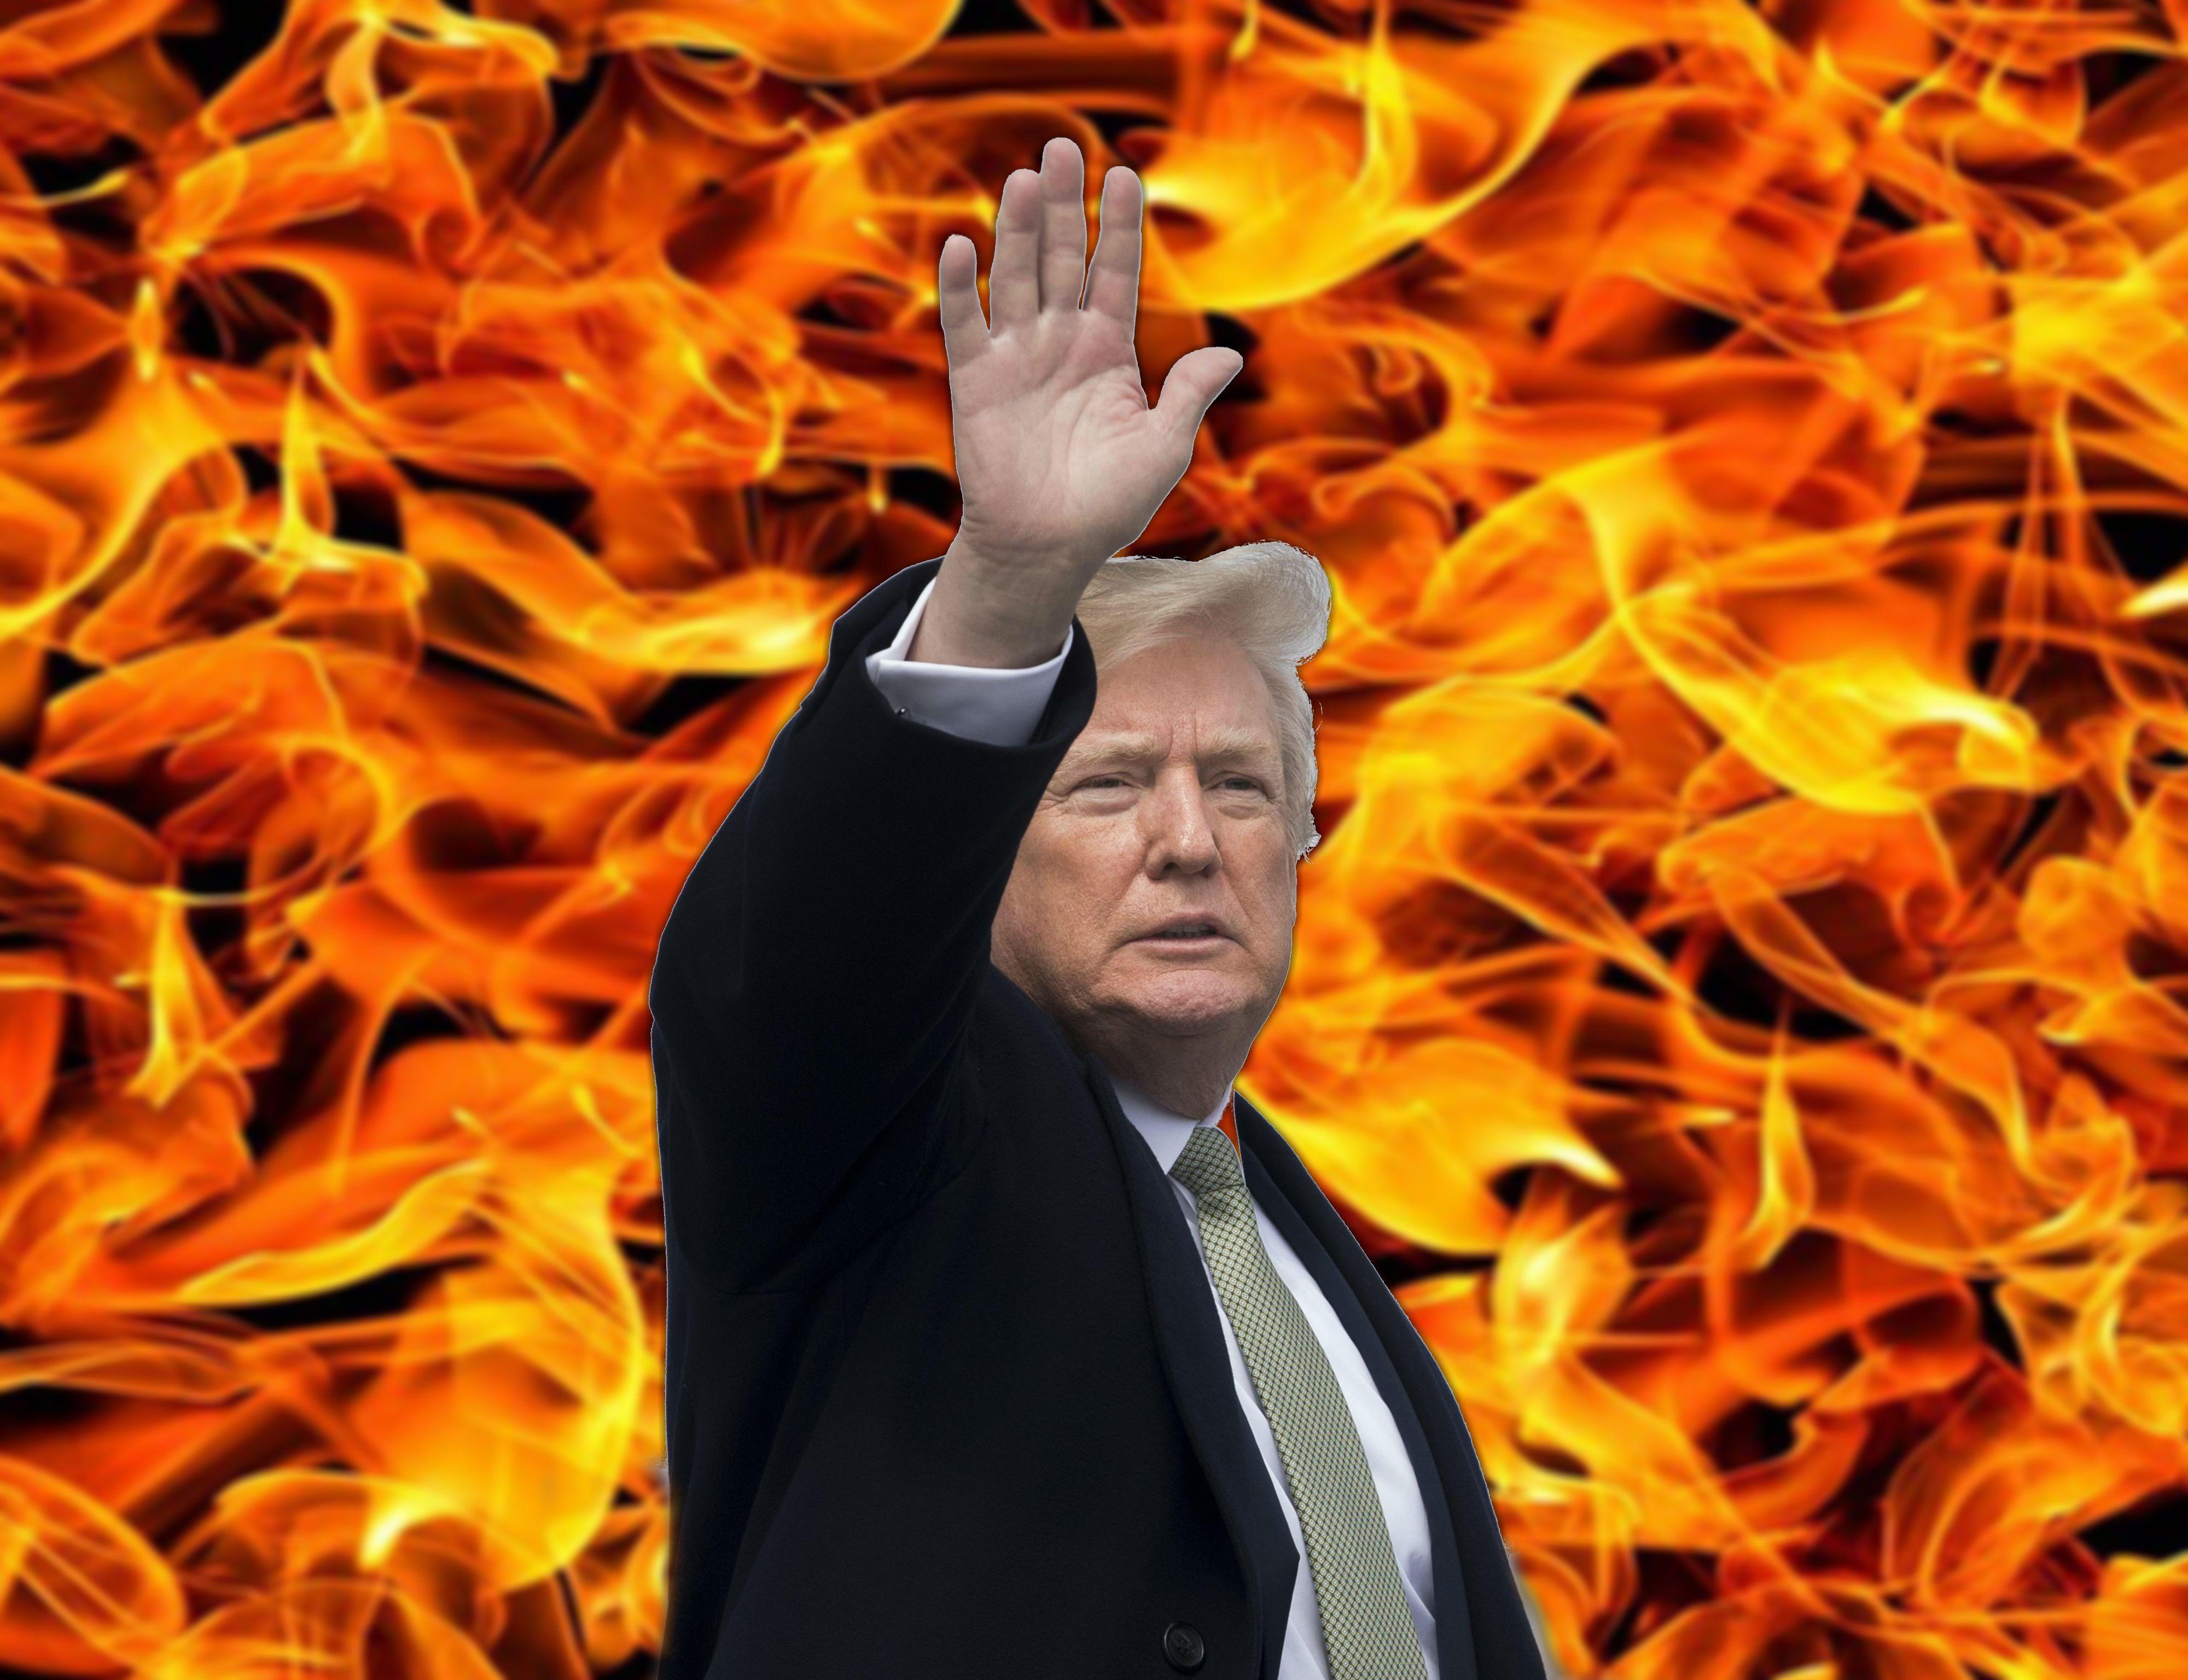 Donald Trump fiamme